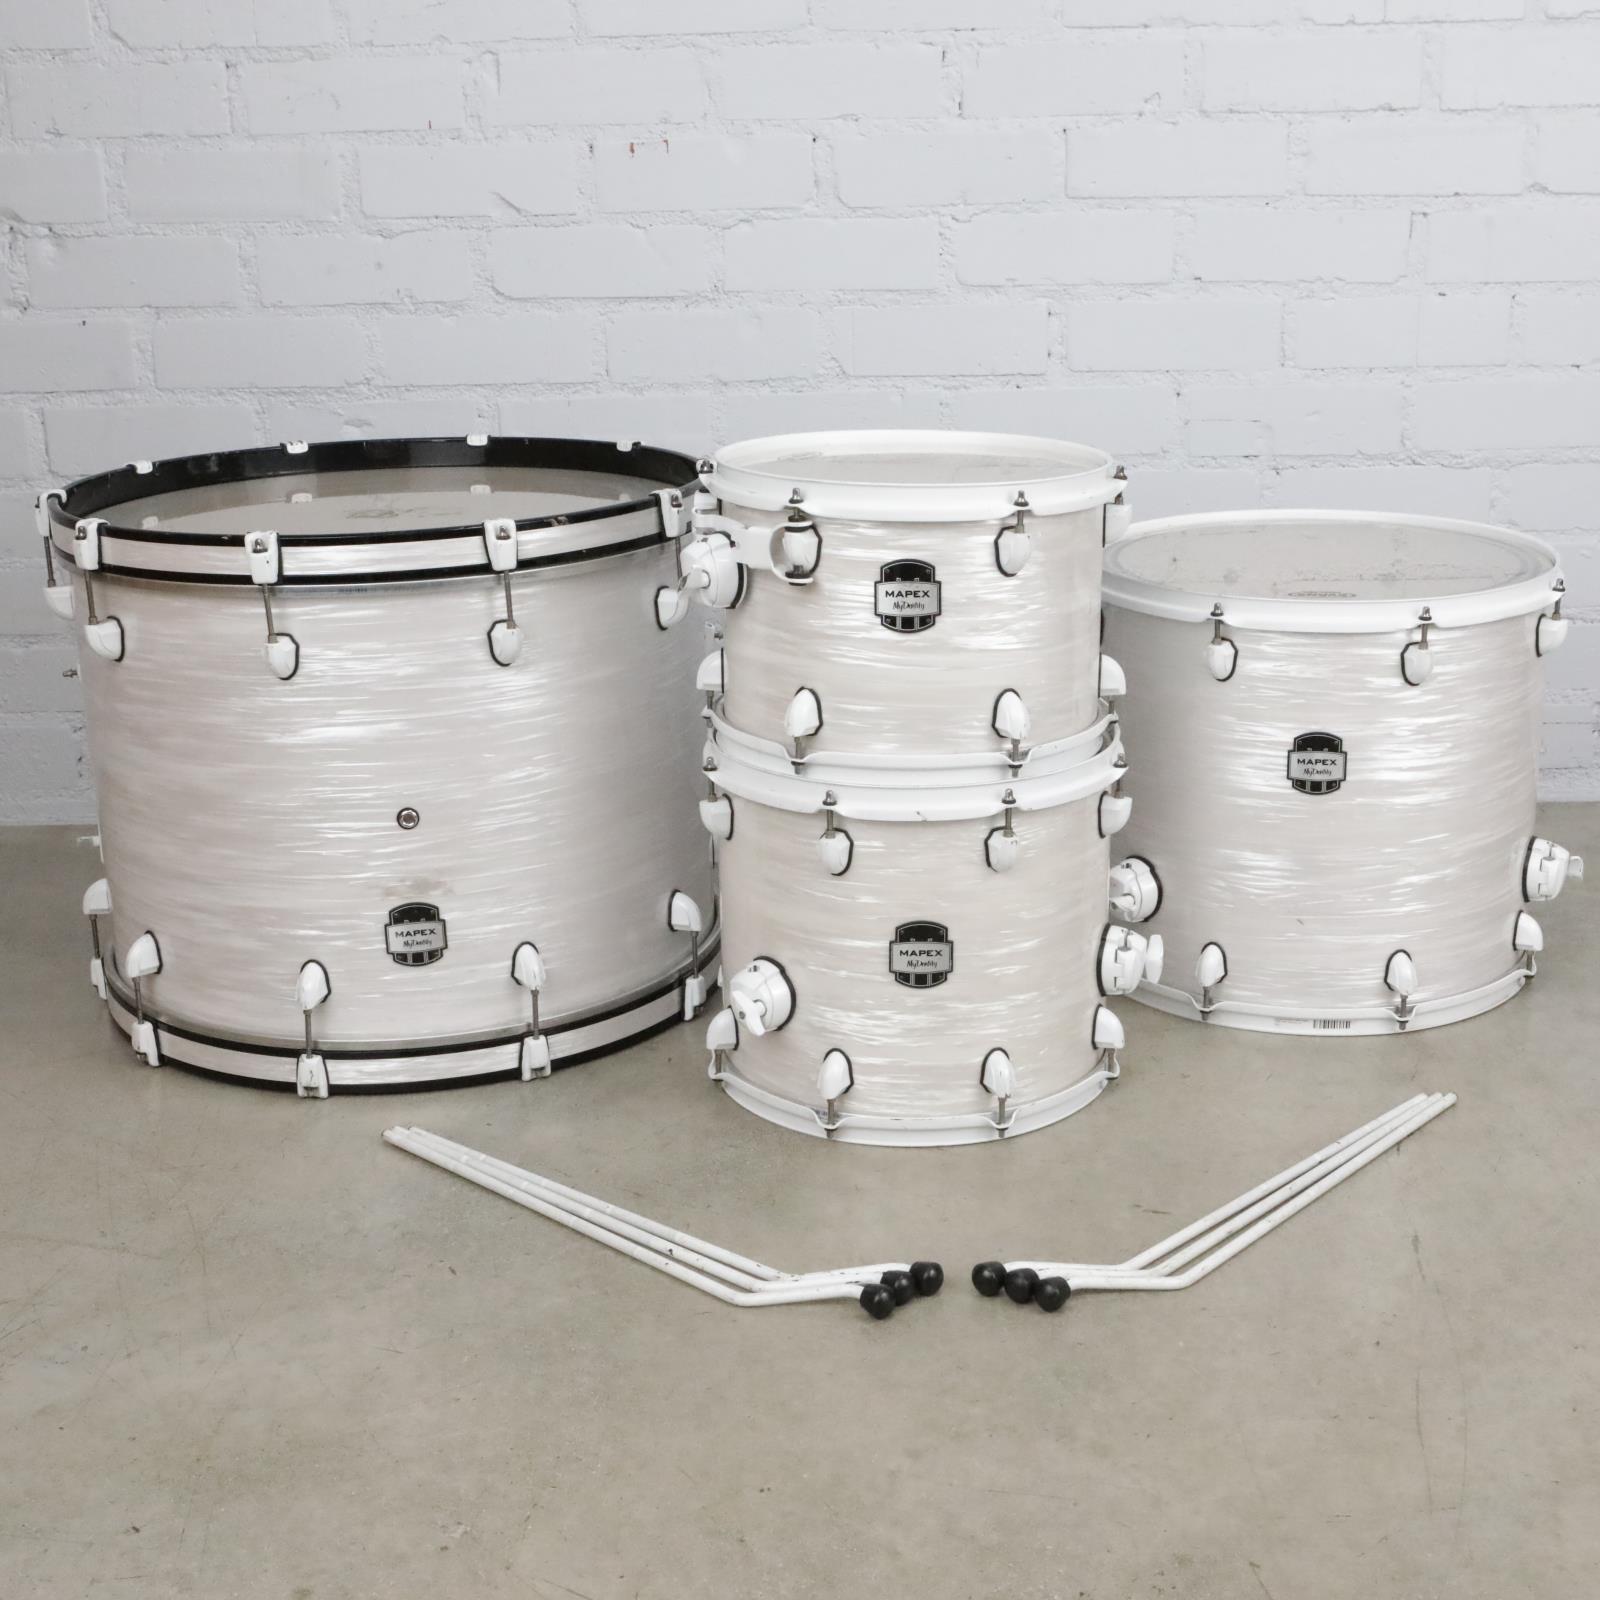 "Mapex MyDentity 4pc White Ripple Marine Pearl Maple Drums 24"" 18"" 14"" 13"" #41075"